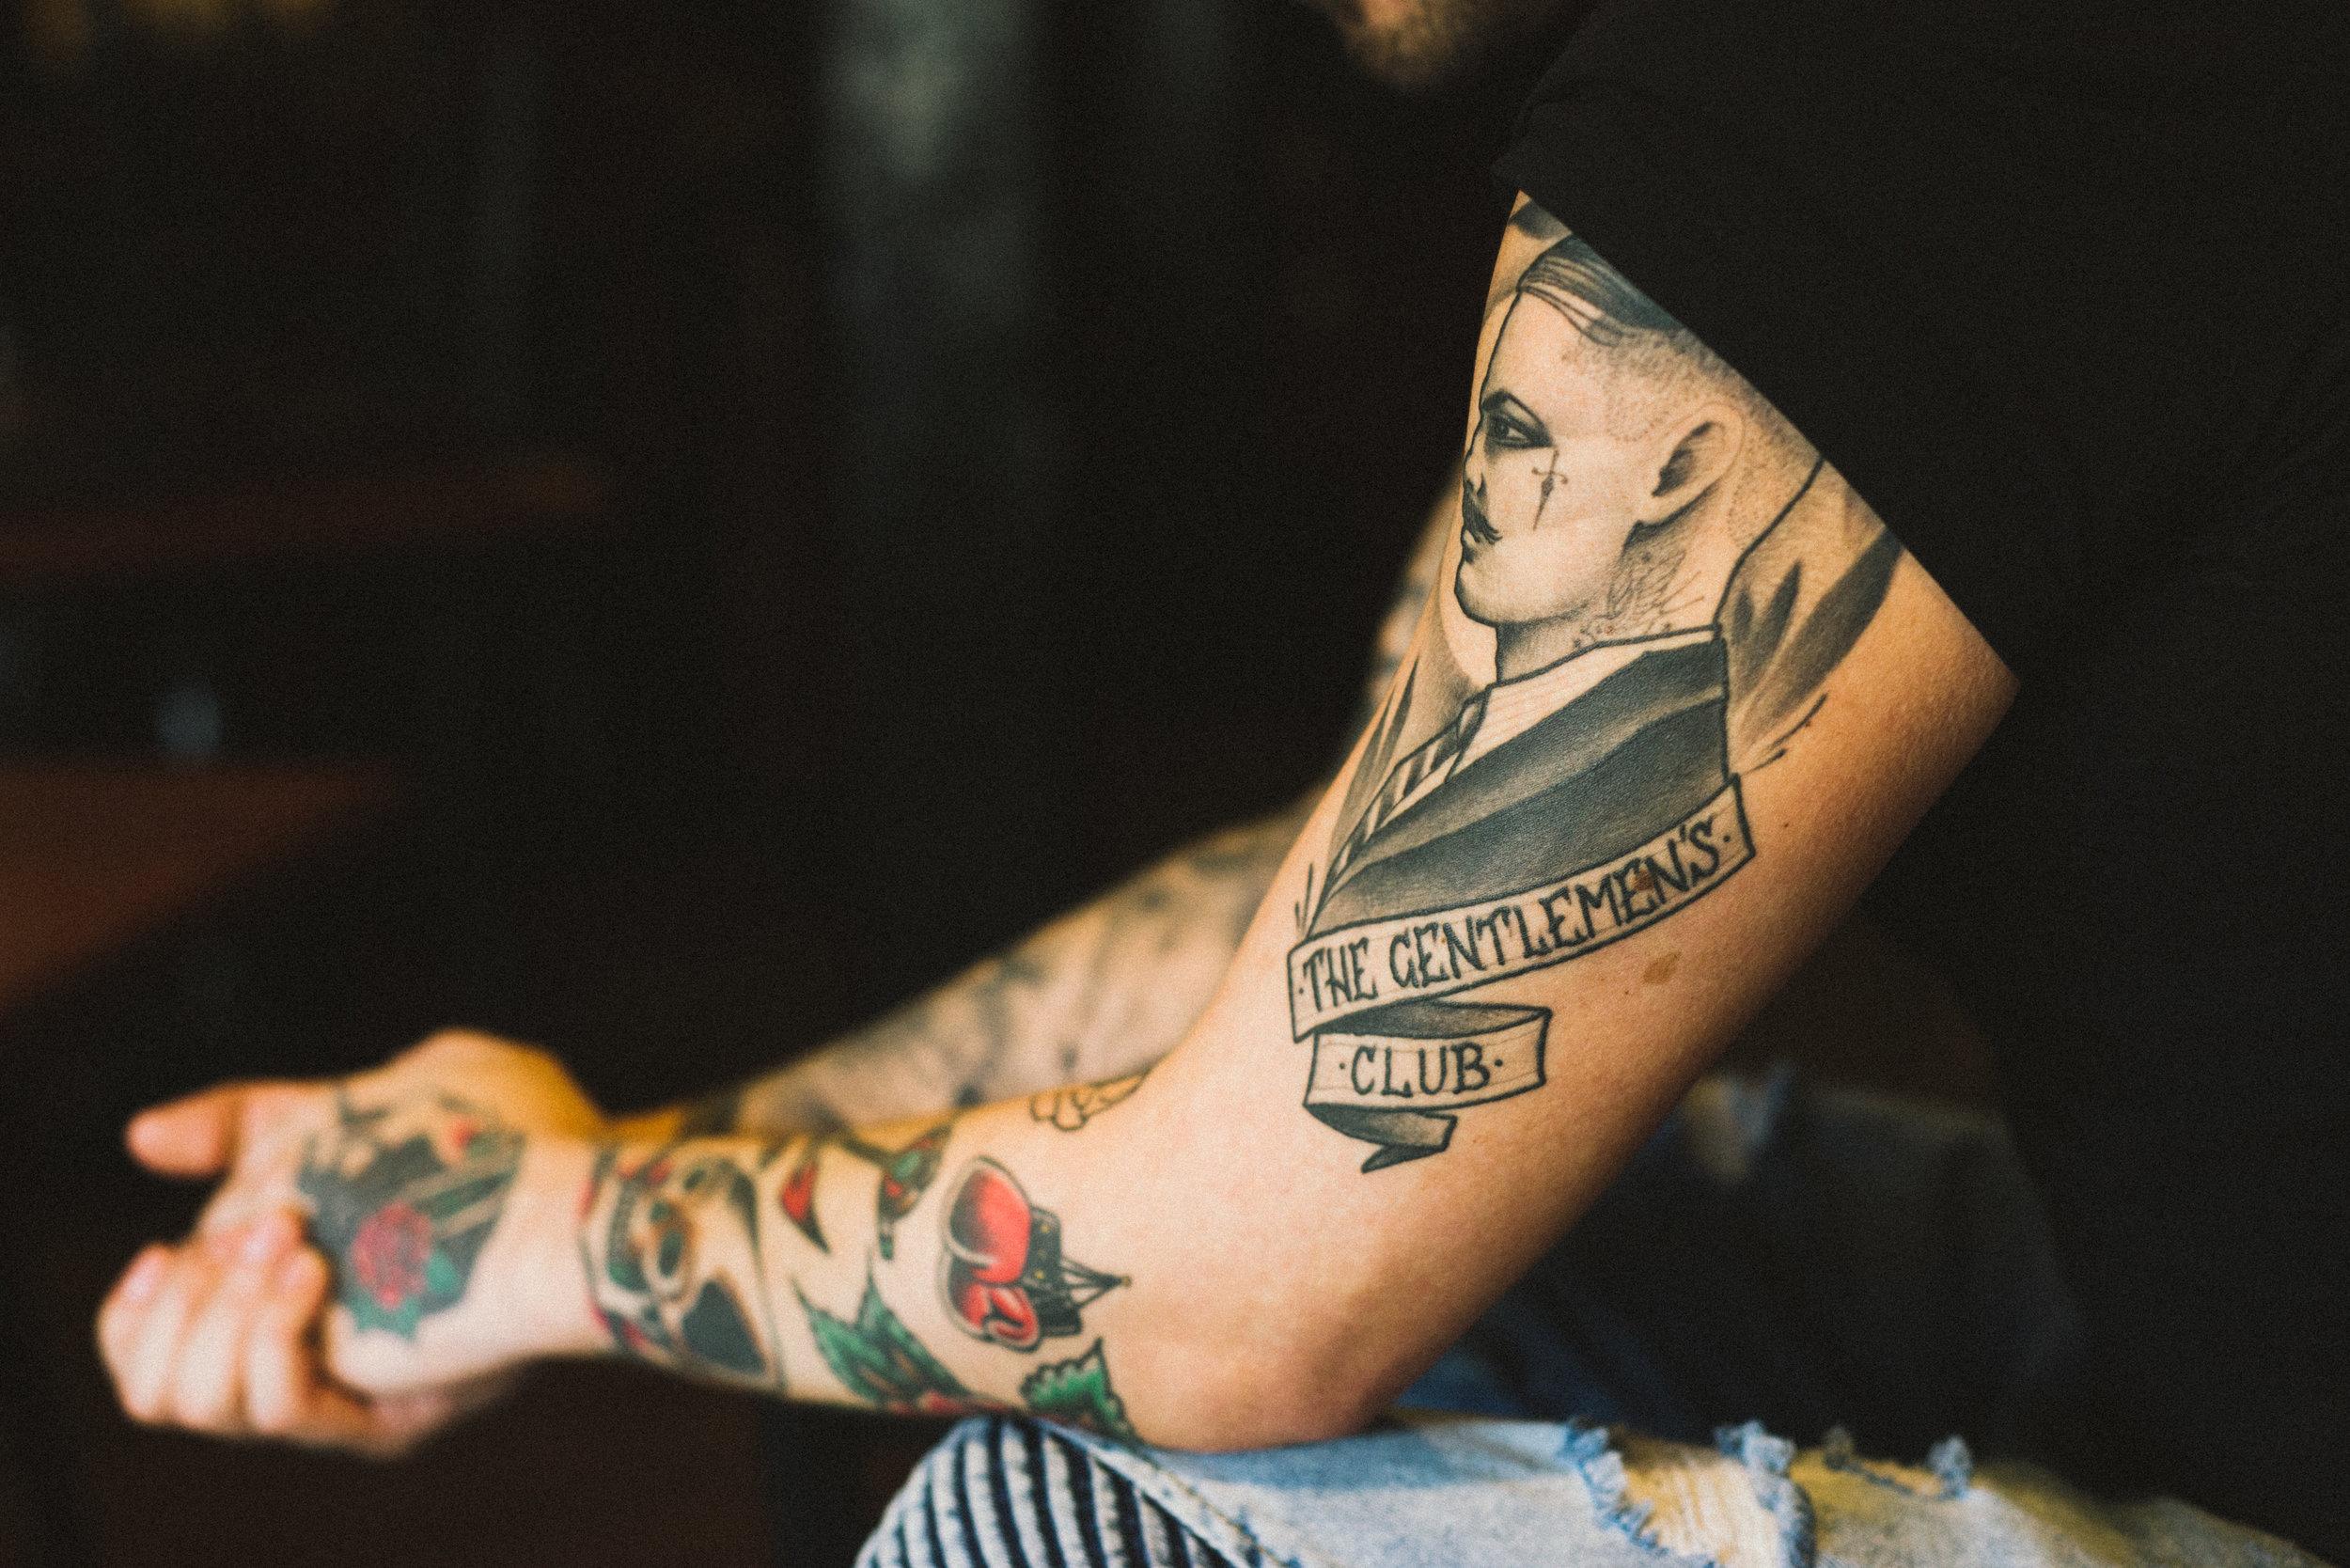 SUYT-Tattoo-Toronto-Adrenaline-Kris-Perez-Scandaleuse-6